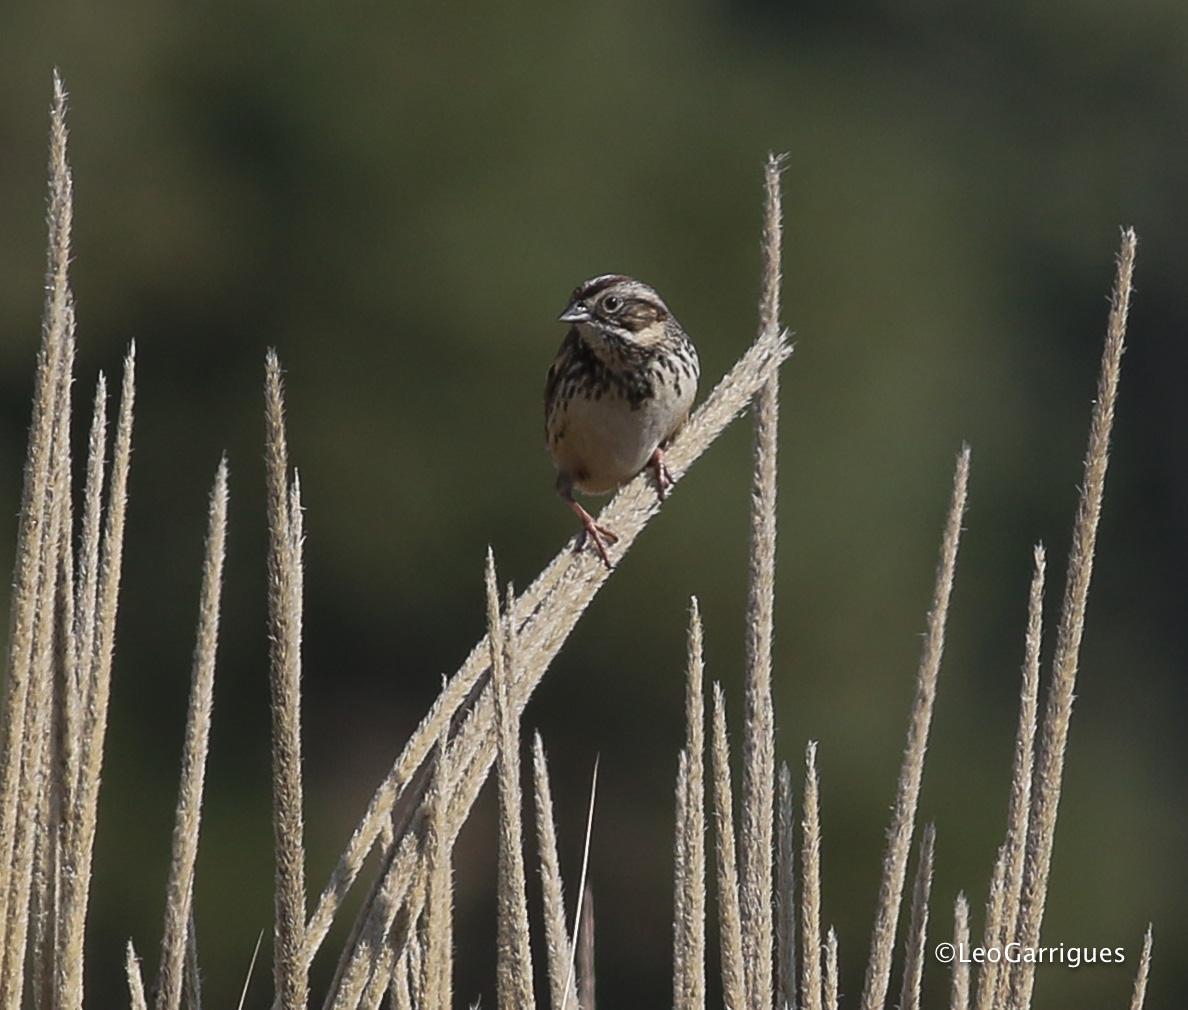 Sierra Madre Sparrow Photo by Leonardo Garrigues